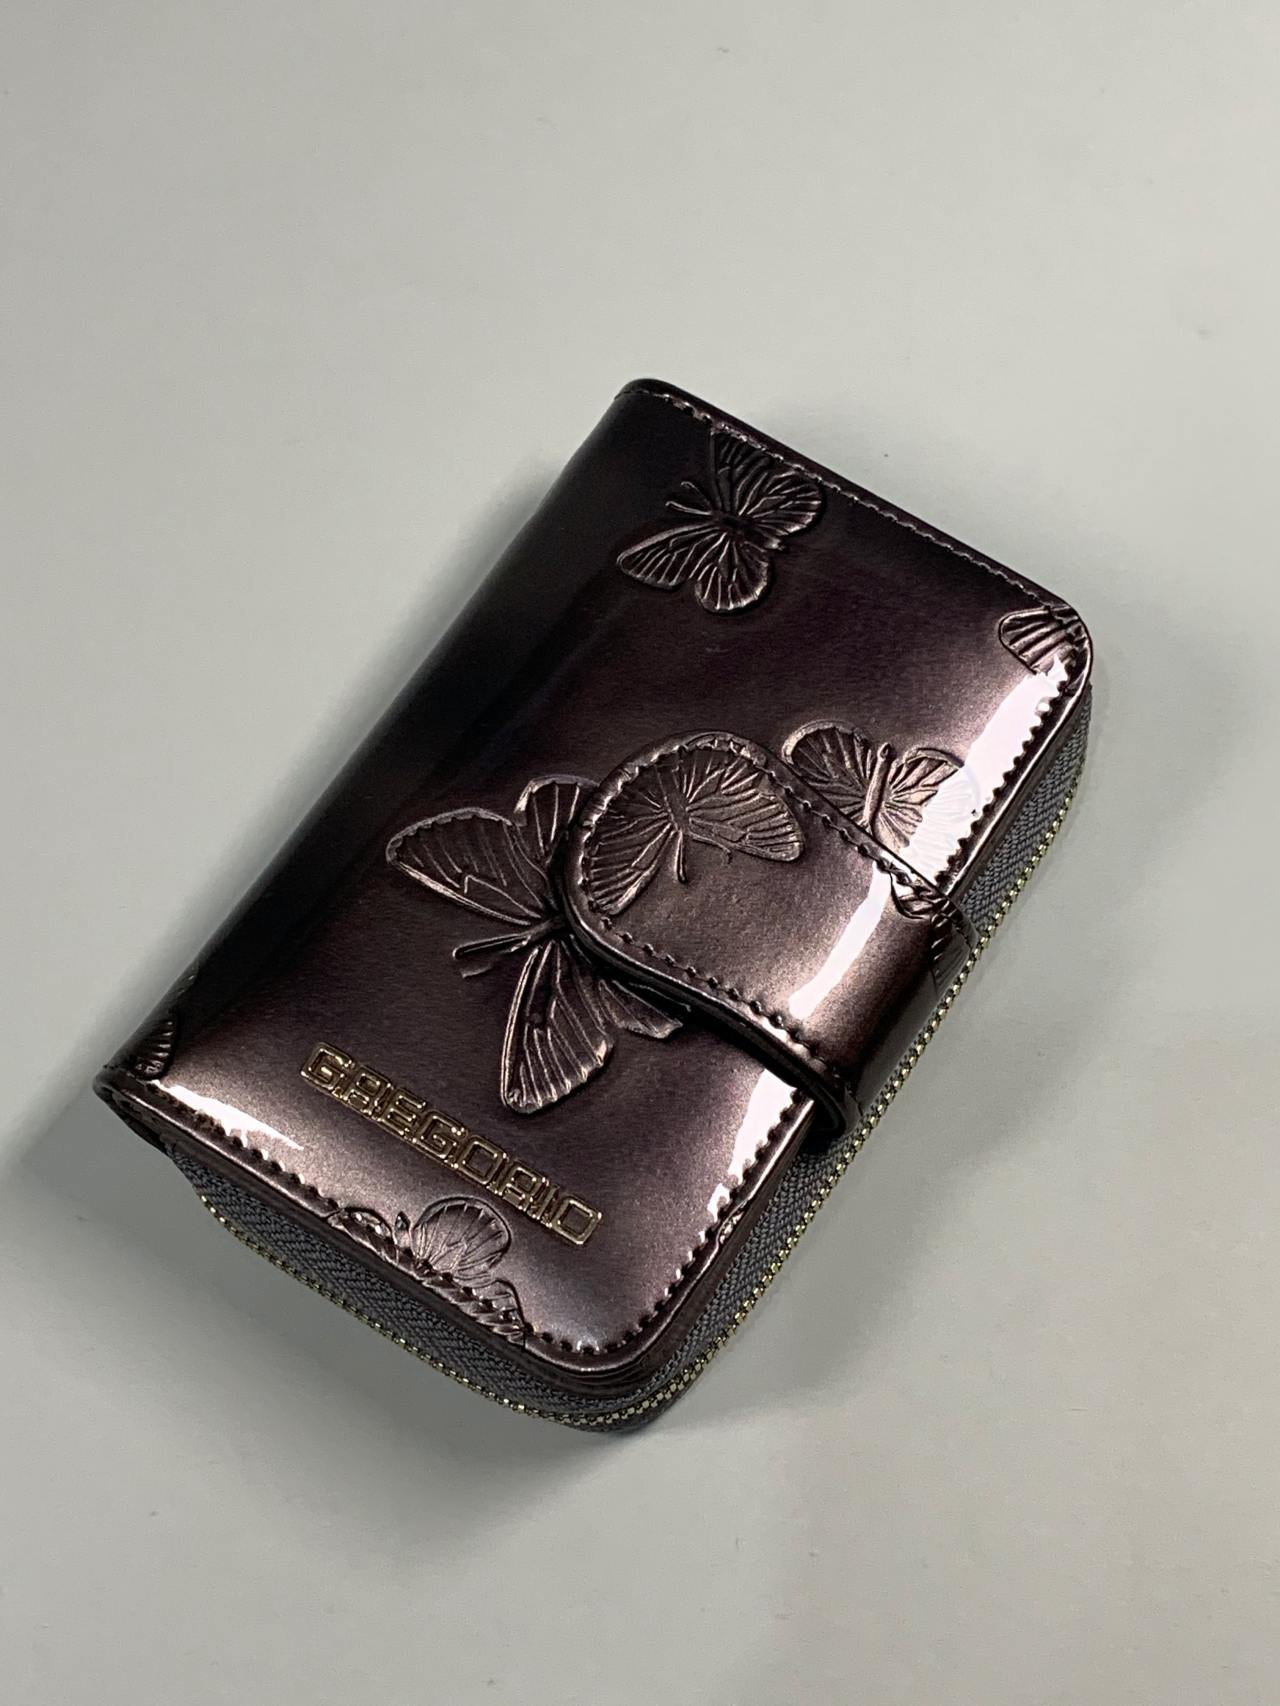 Kožená peněženka Gregorio S šedá s motýly -01